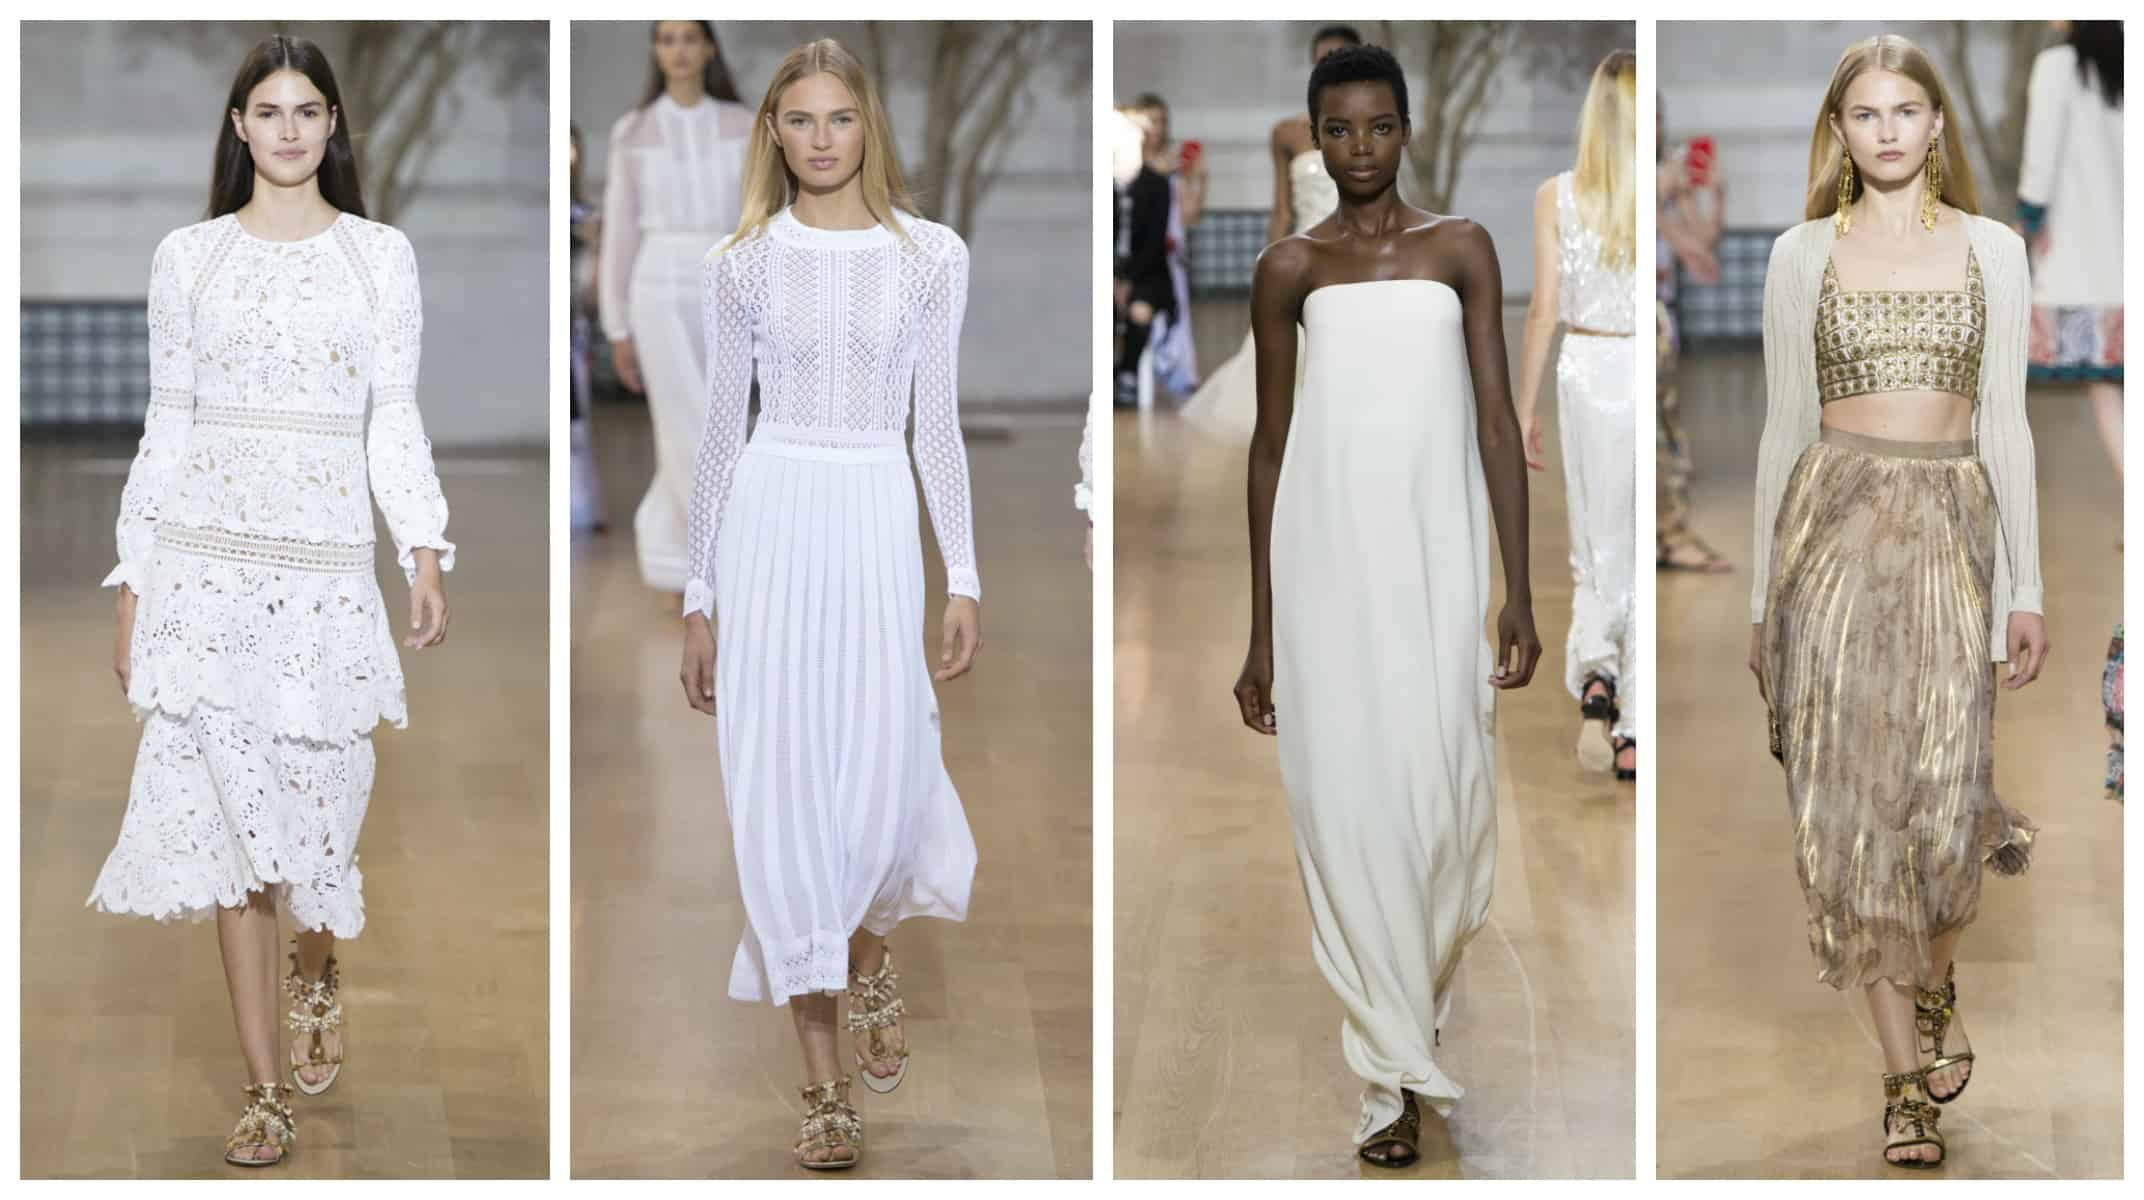 New York Fashion Week Spring 2017 - Oscar de la Renta